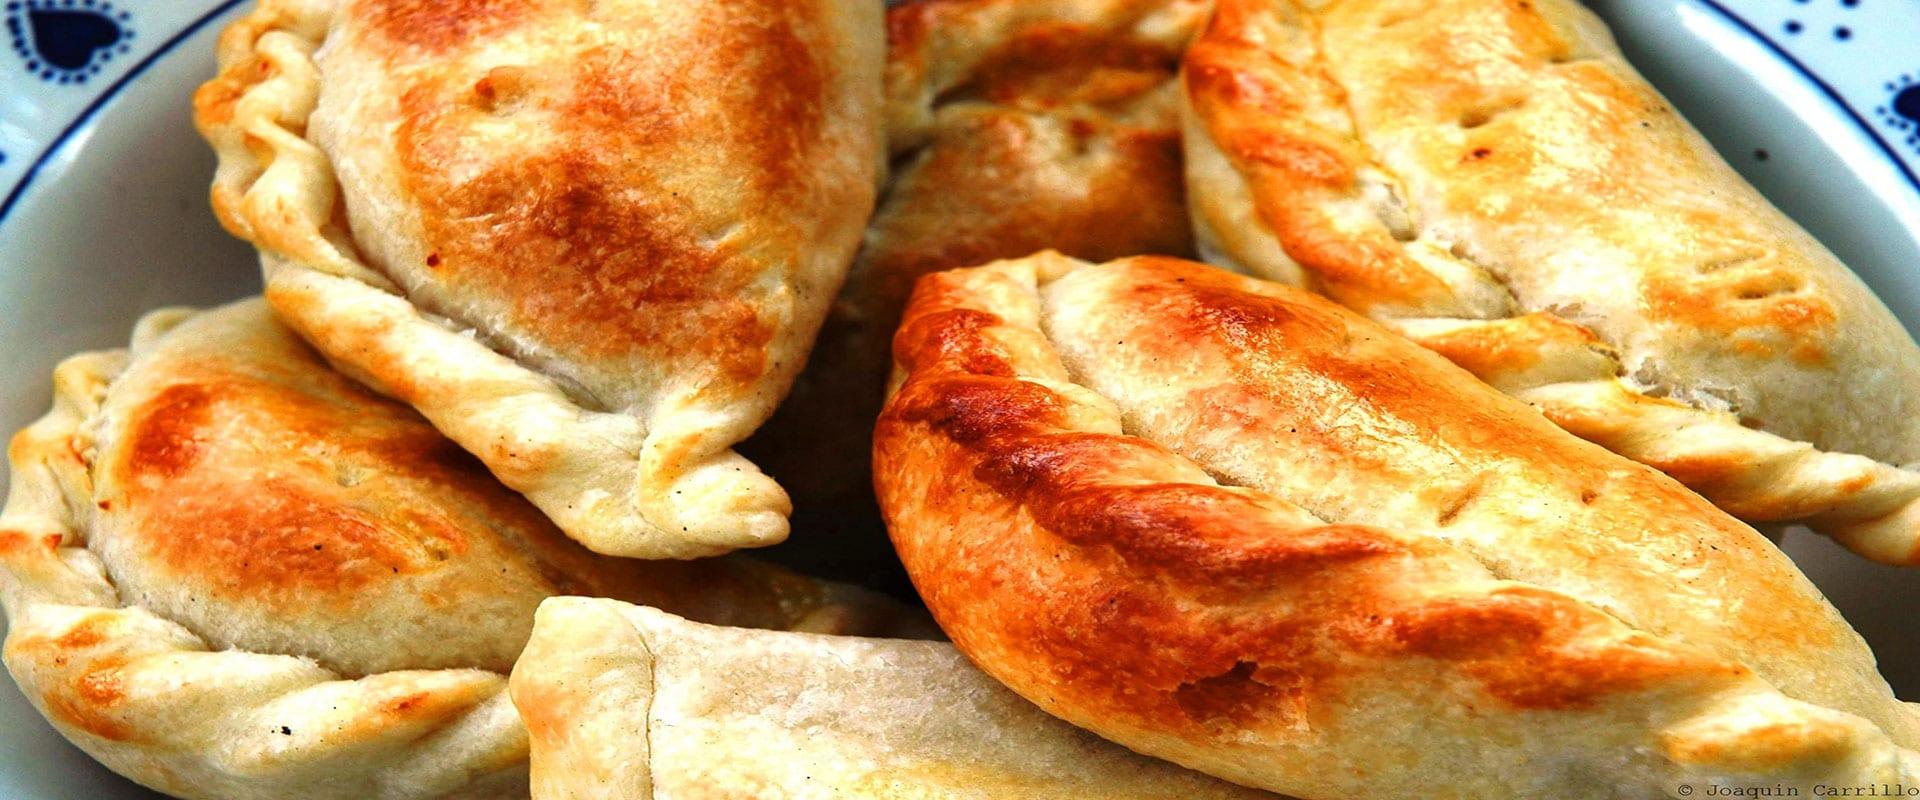 empanadas recette